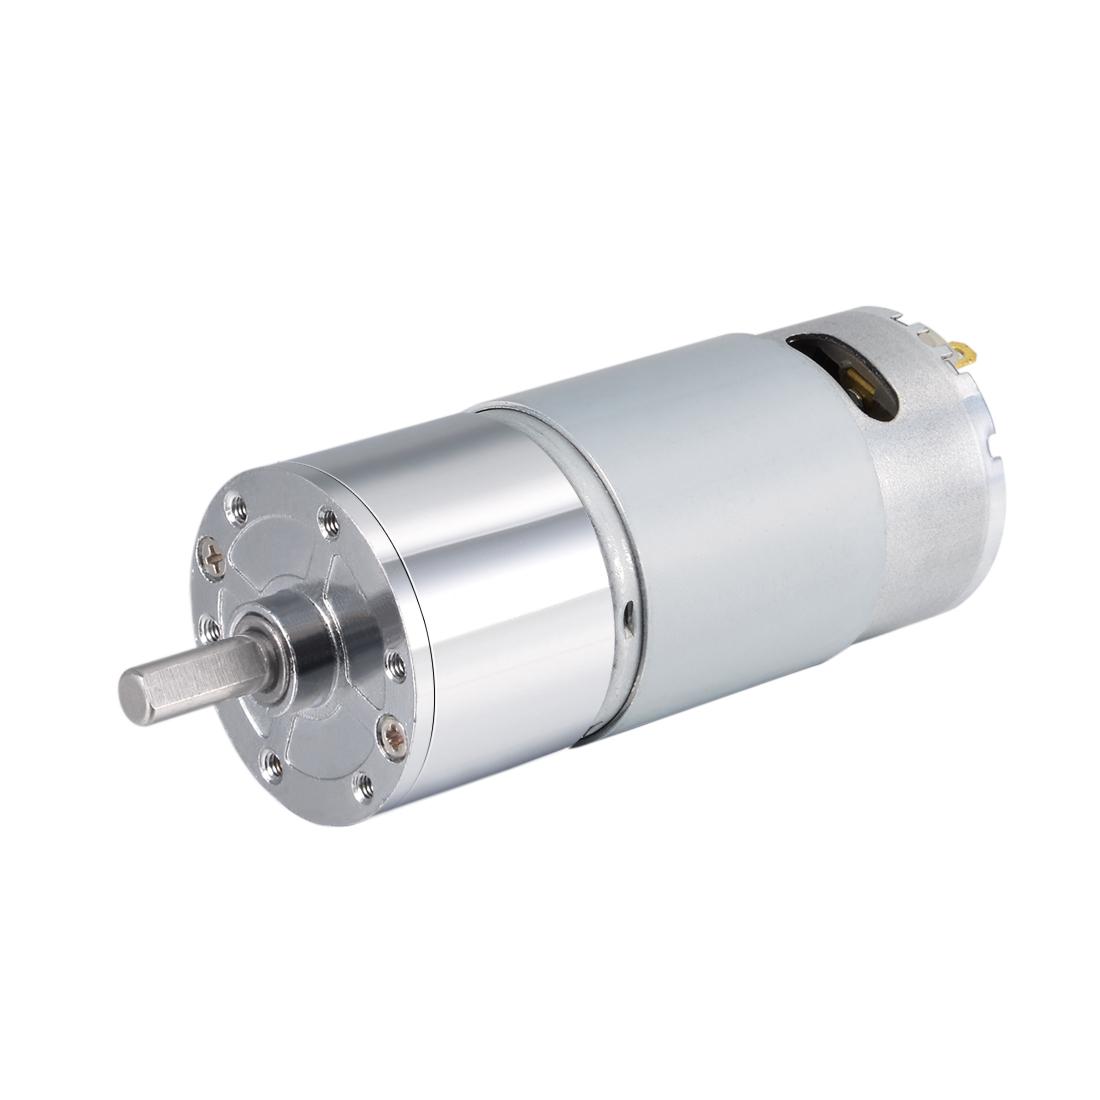 12V DC 200 RPM Gear Motor High Torque Reduction Gearbox Centric Output D Shaft